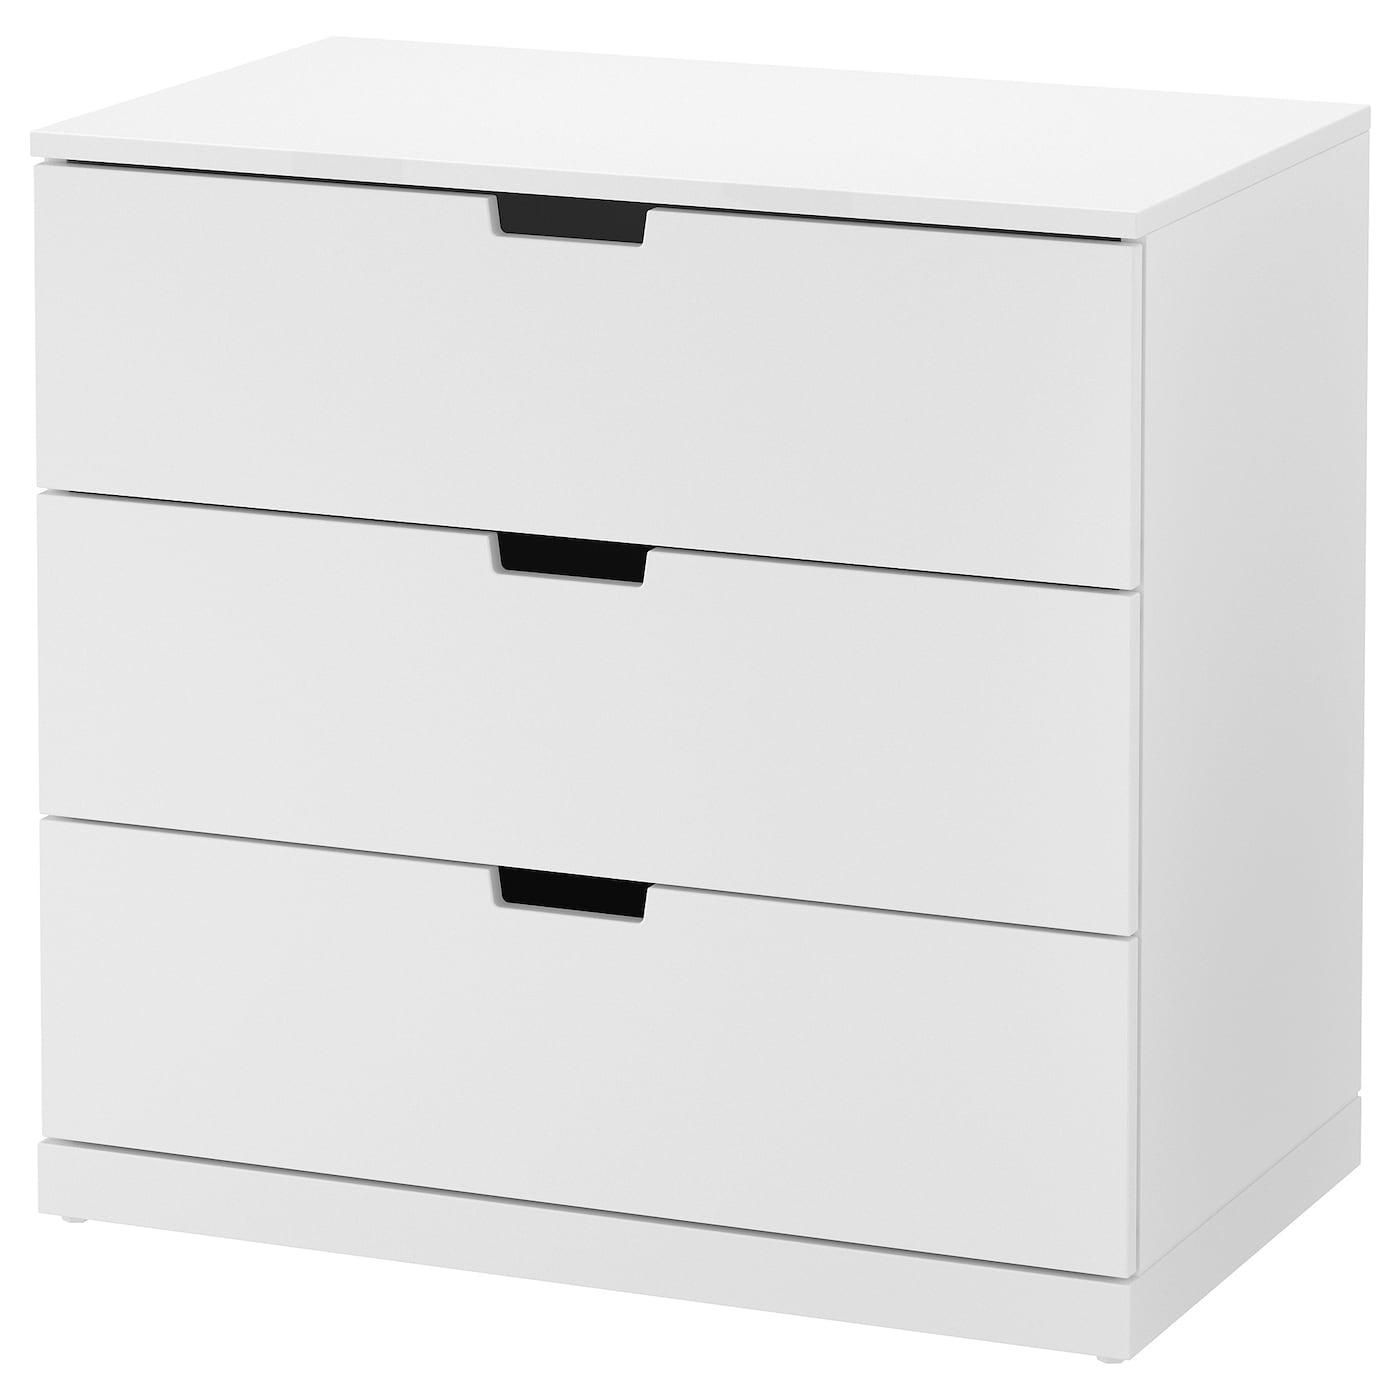 nordli commode 3 tiroirs blanc 80 x 76 cm ikea. Black Bedroom Furniture Sets. Home Design Ideas